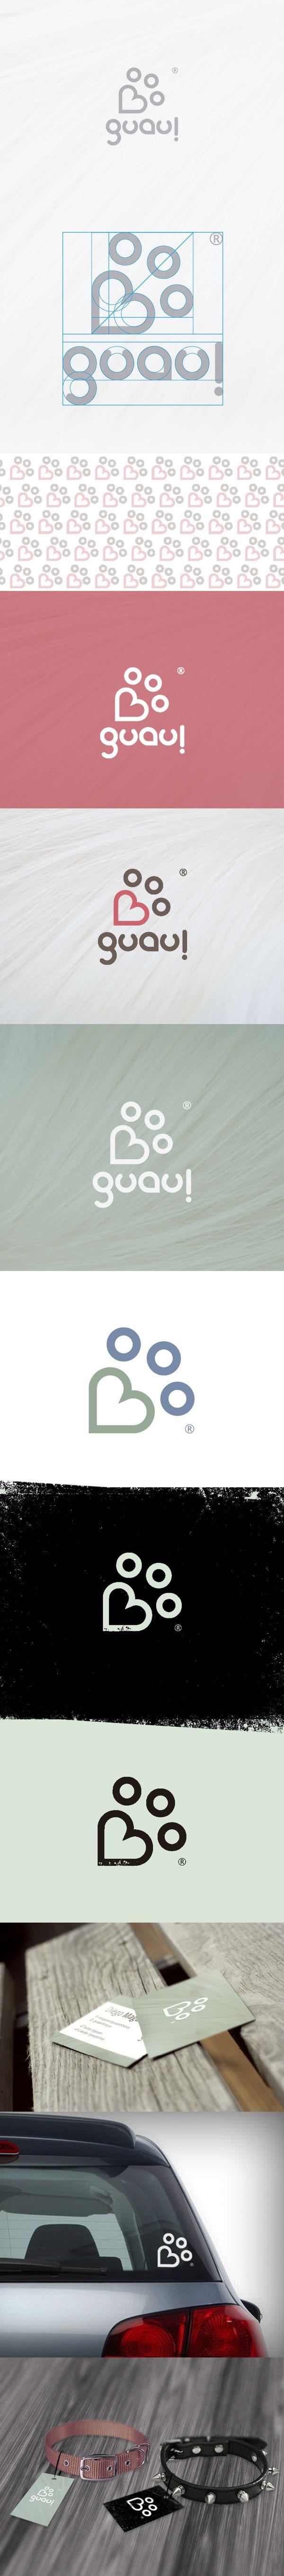 Pet Shop Logo by nacho gentini, via Behance